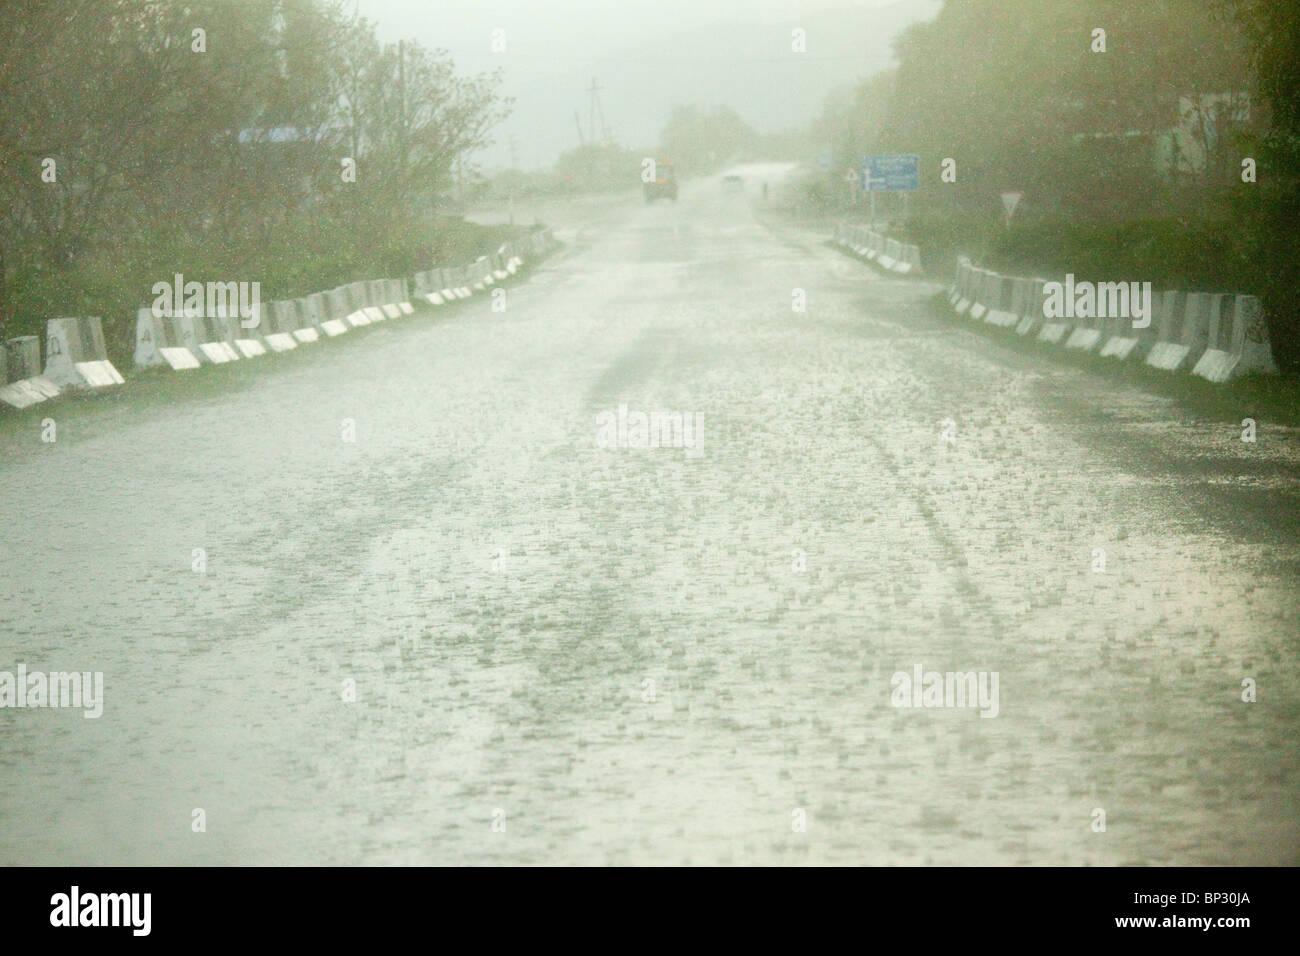 Heavy rain near Ananuri in the Great Caucasus, Georgia. - Stock Image